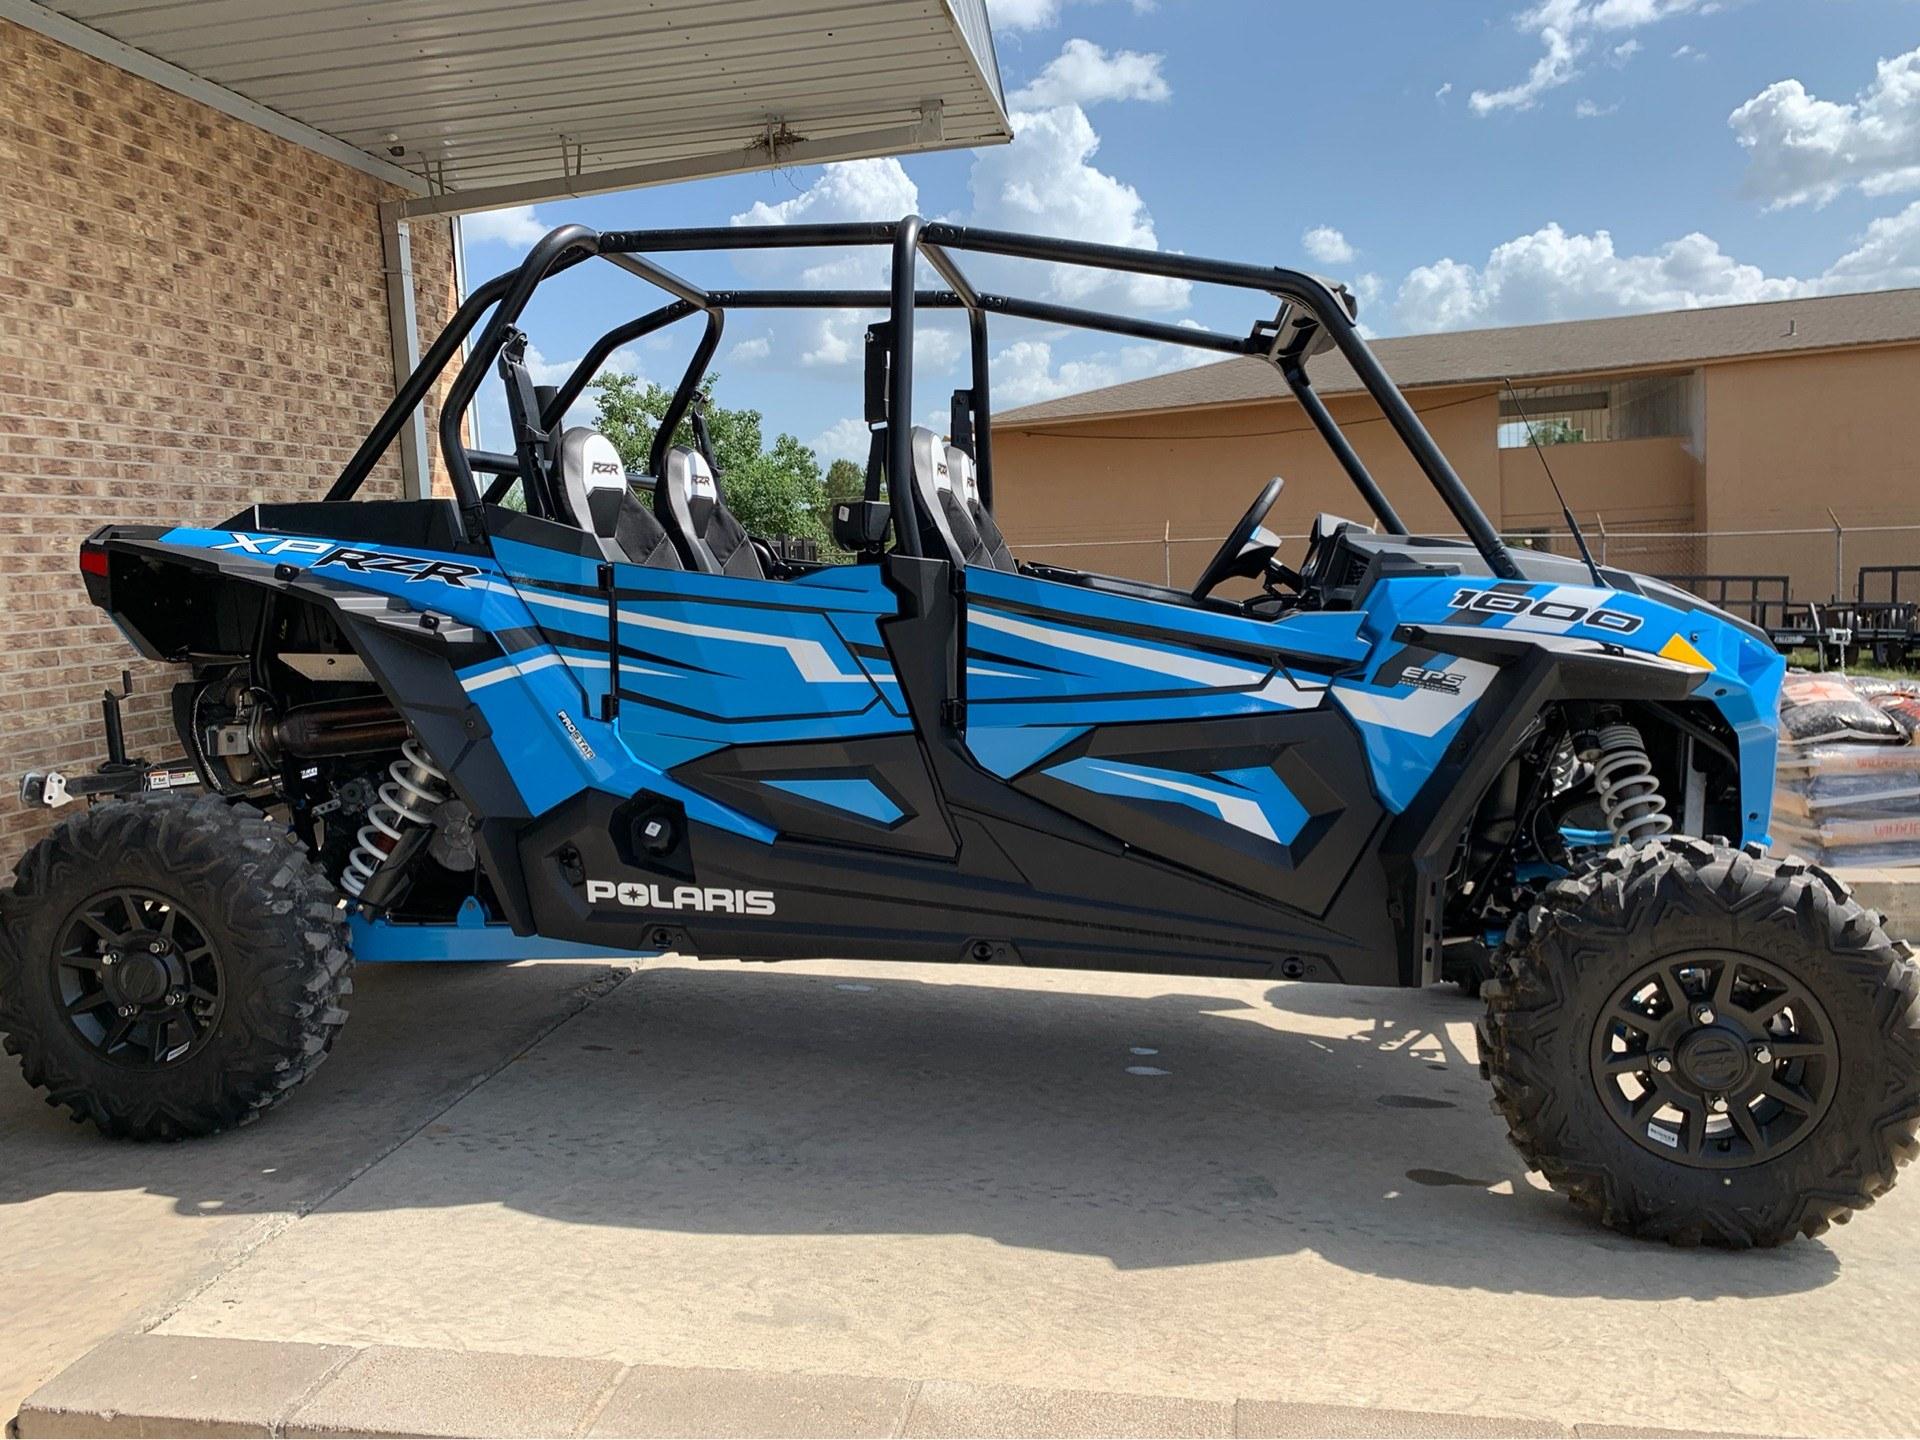 2019 Polaris RZR XP 4 1000 EPS Ride Command Edition in Marshall, Texas